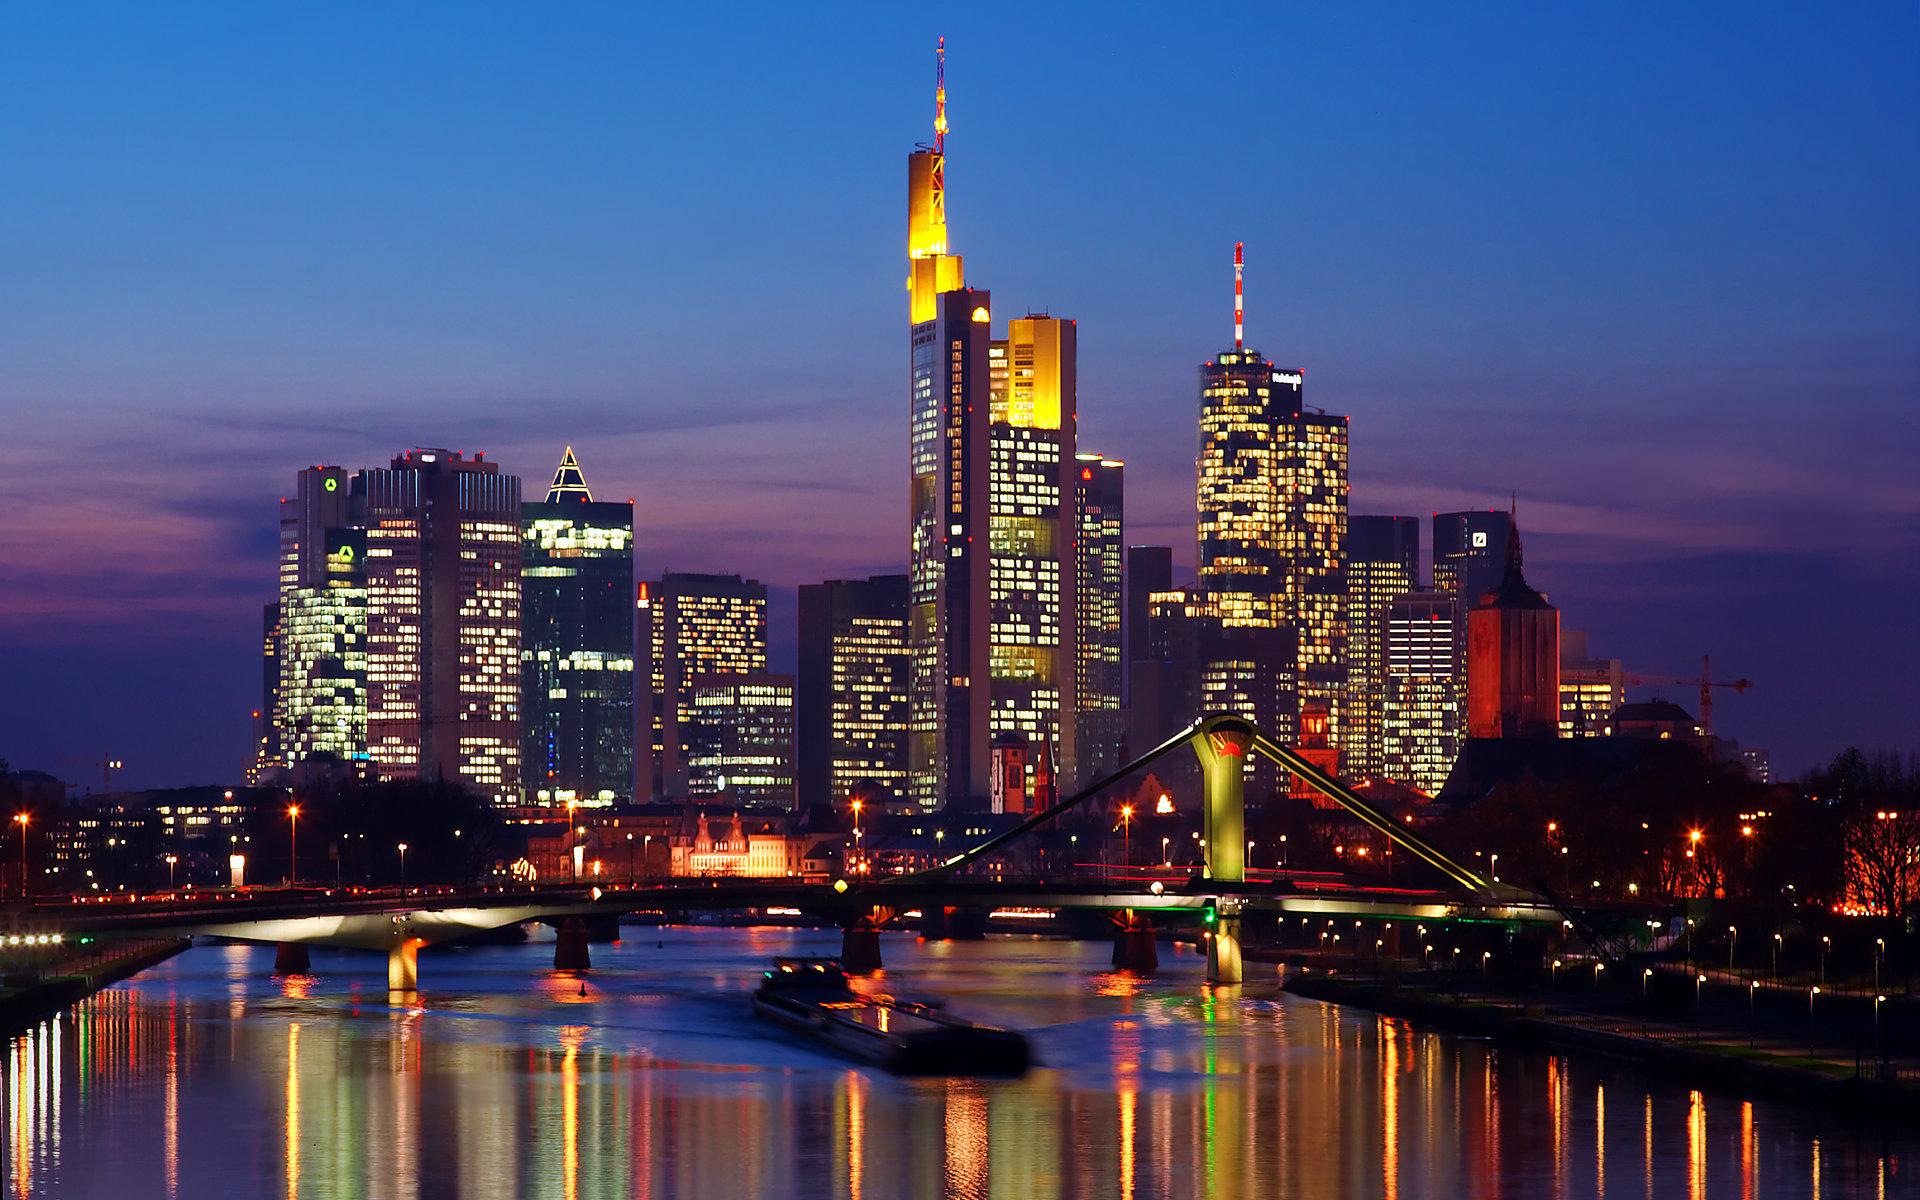 16.08.12-Frankfurt